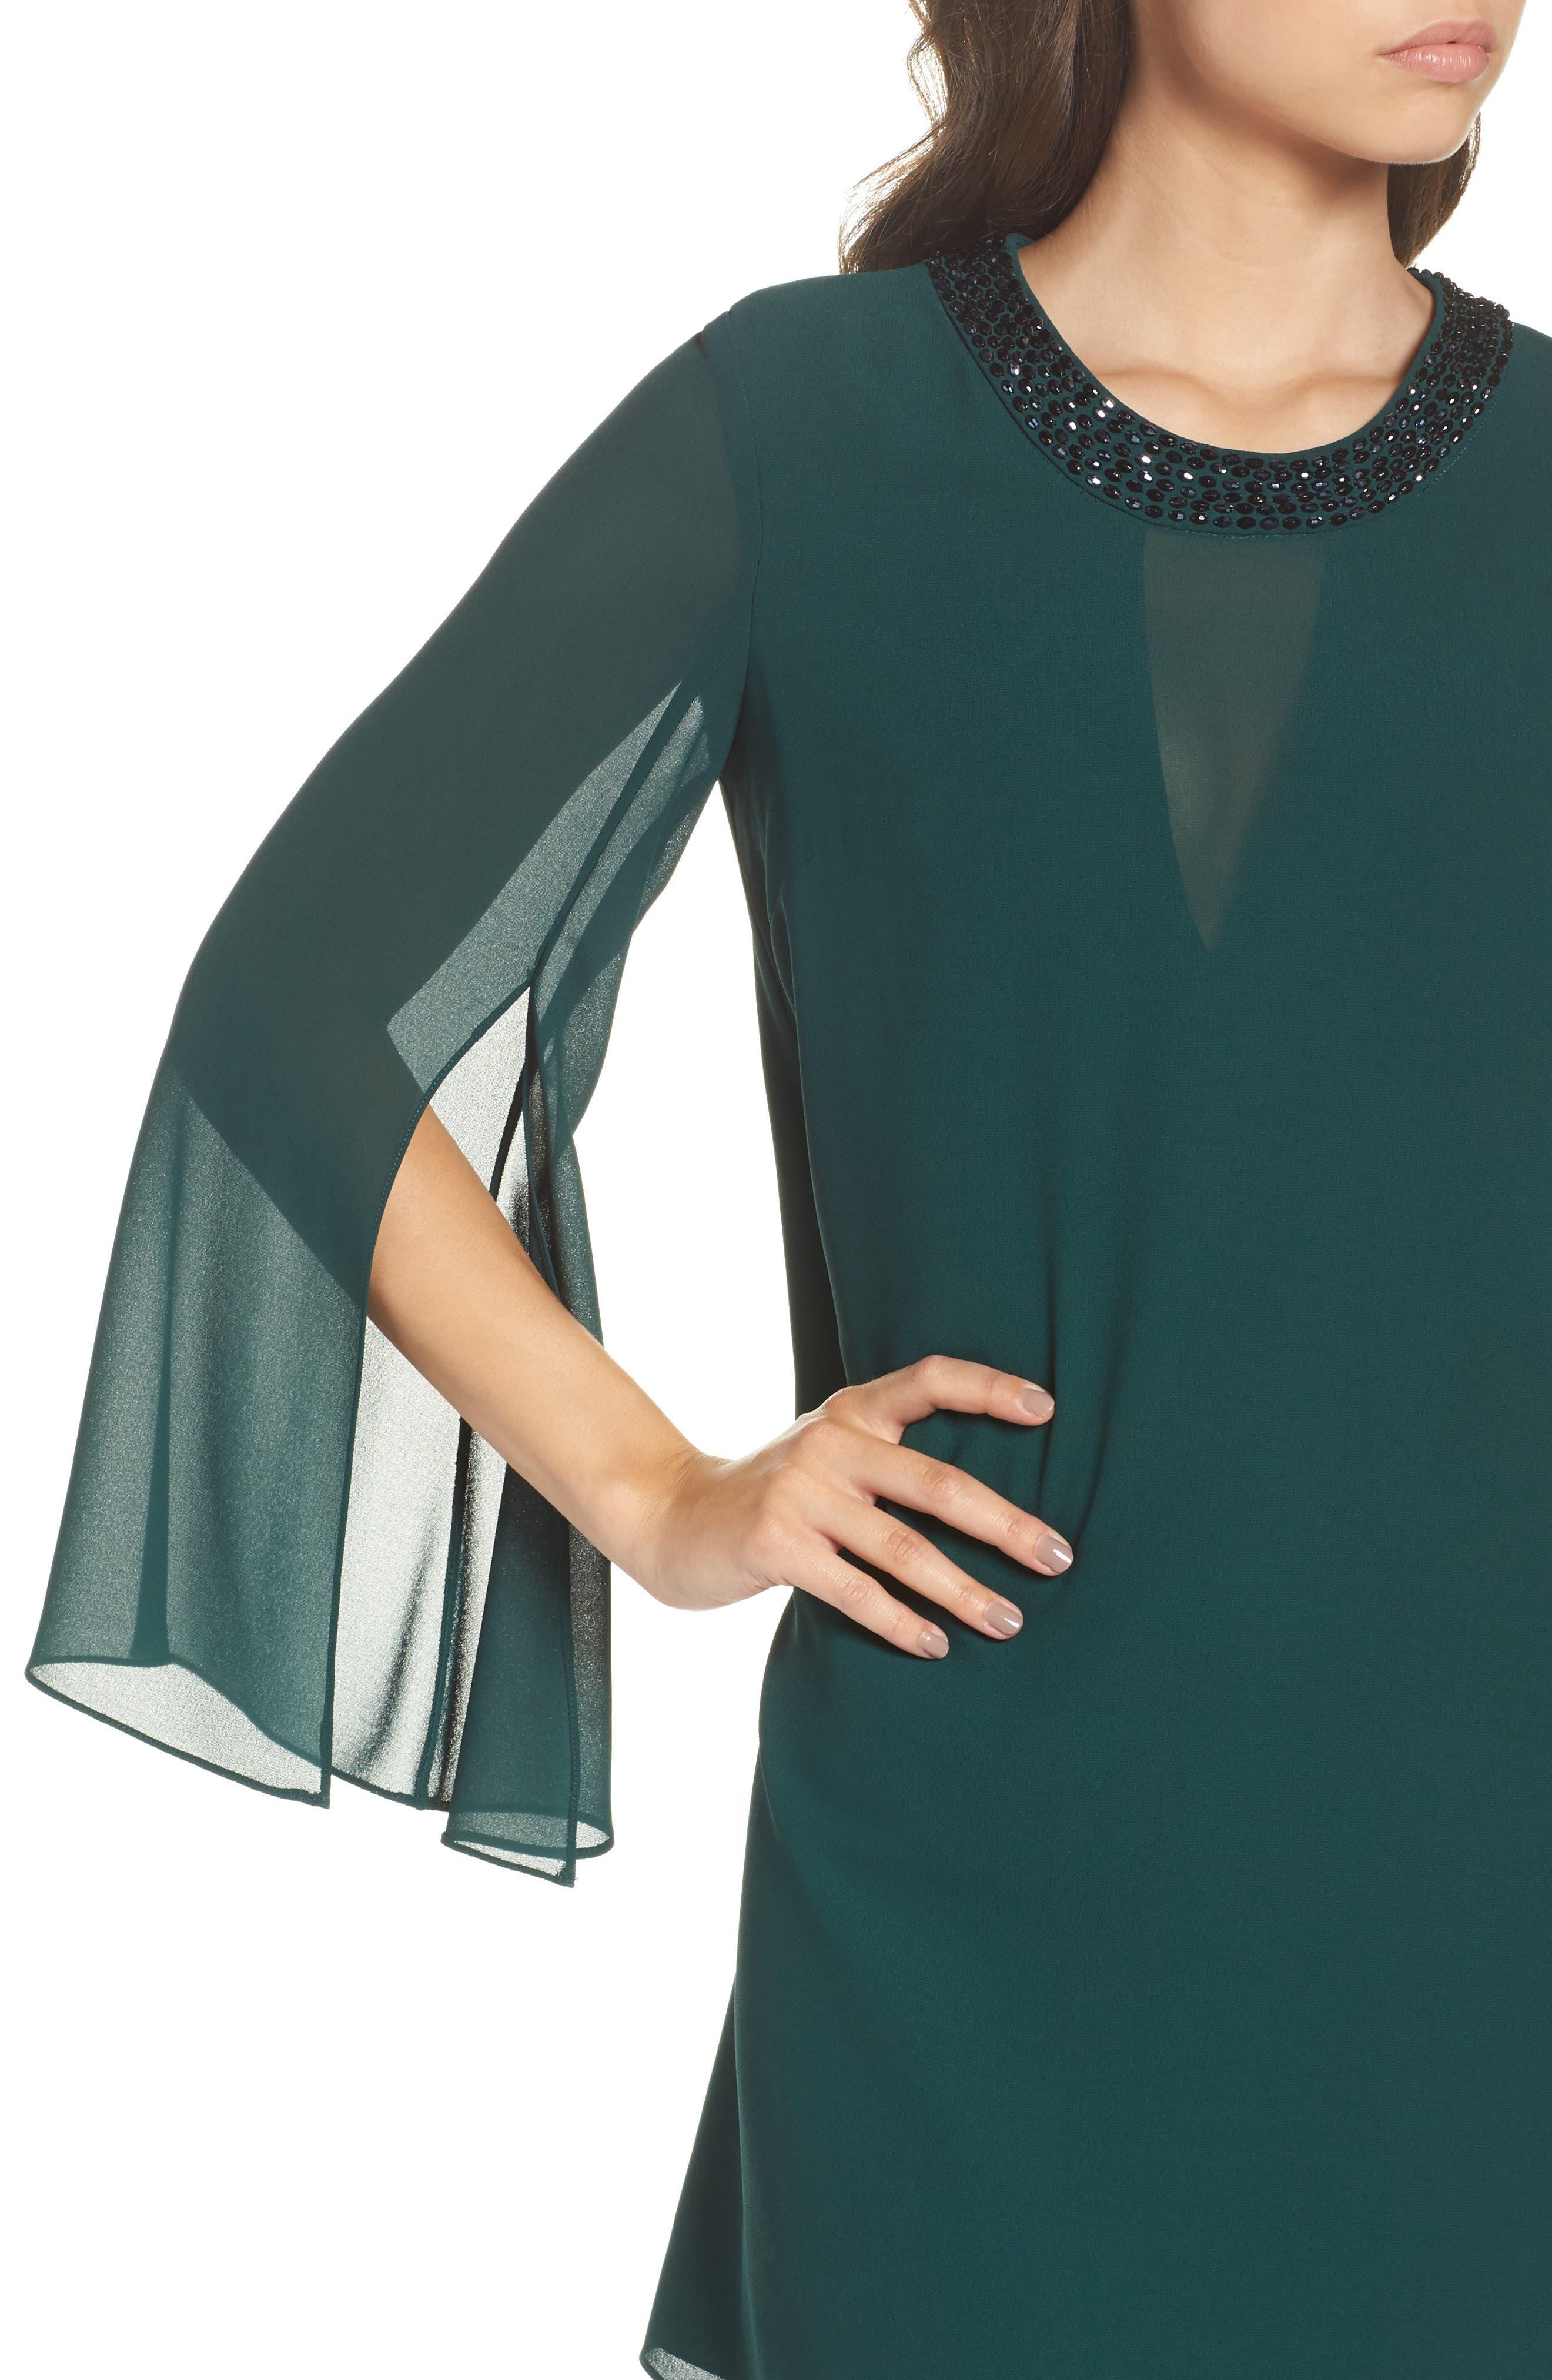 Embellished Chiffon Shift Dress,                             Alternate thumbnail 4, color,                             302